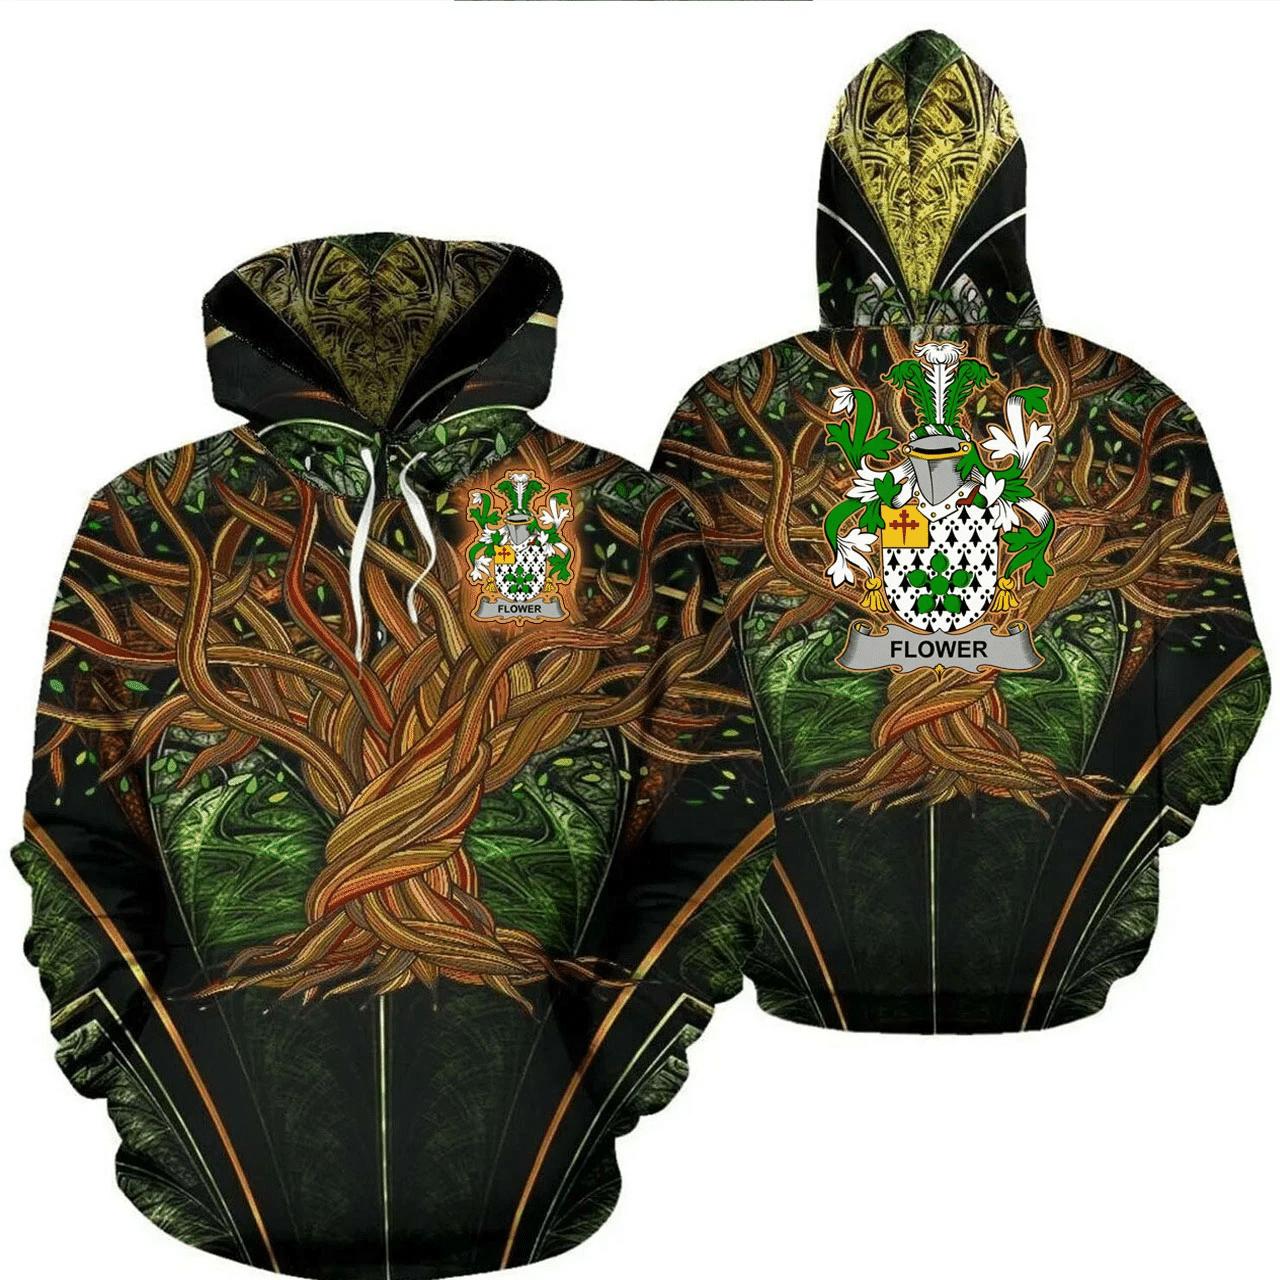 1stIreland Ireland Hoodie - Flower Irish Family Crest Hoodie - Tree Of Life A7